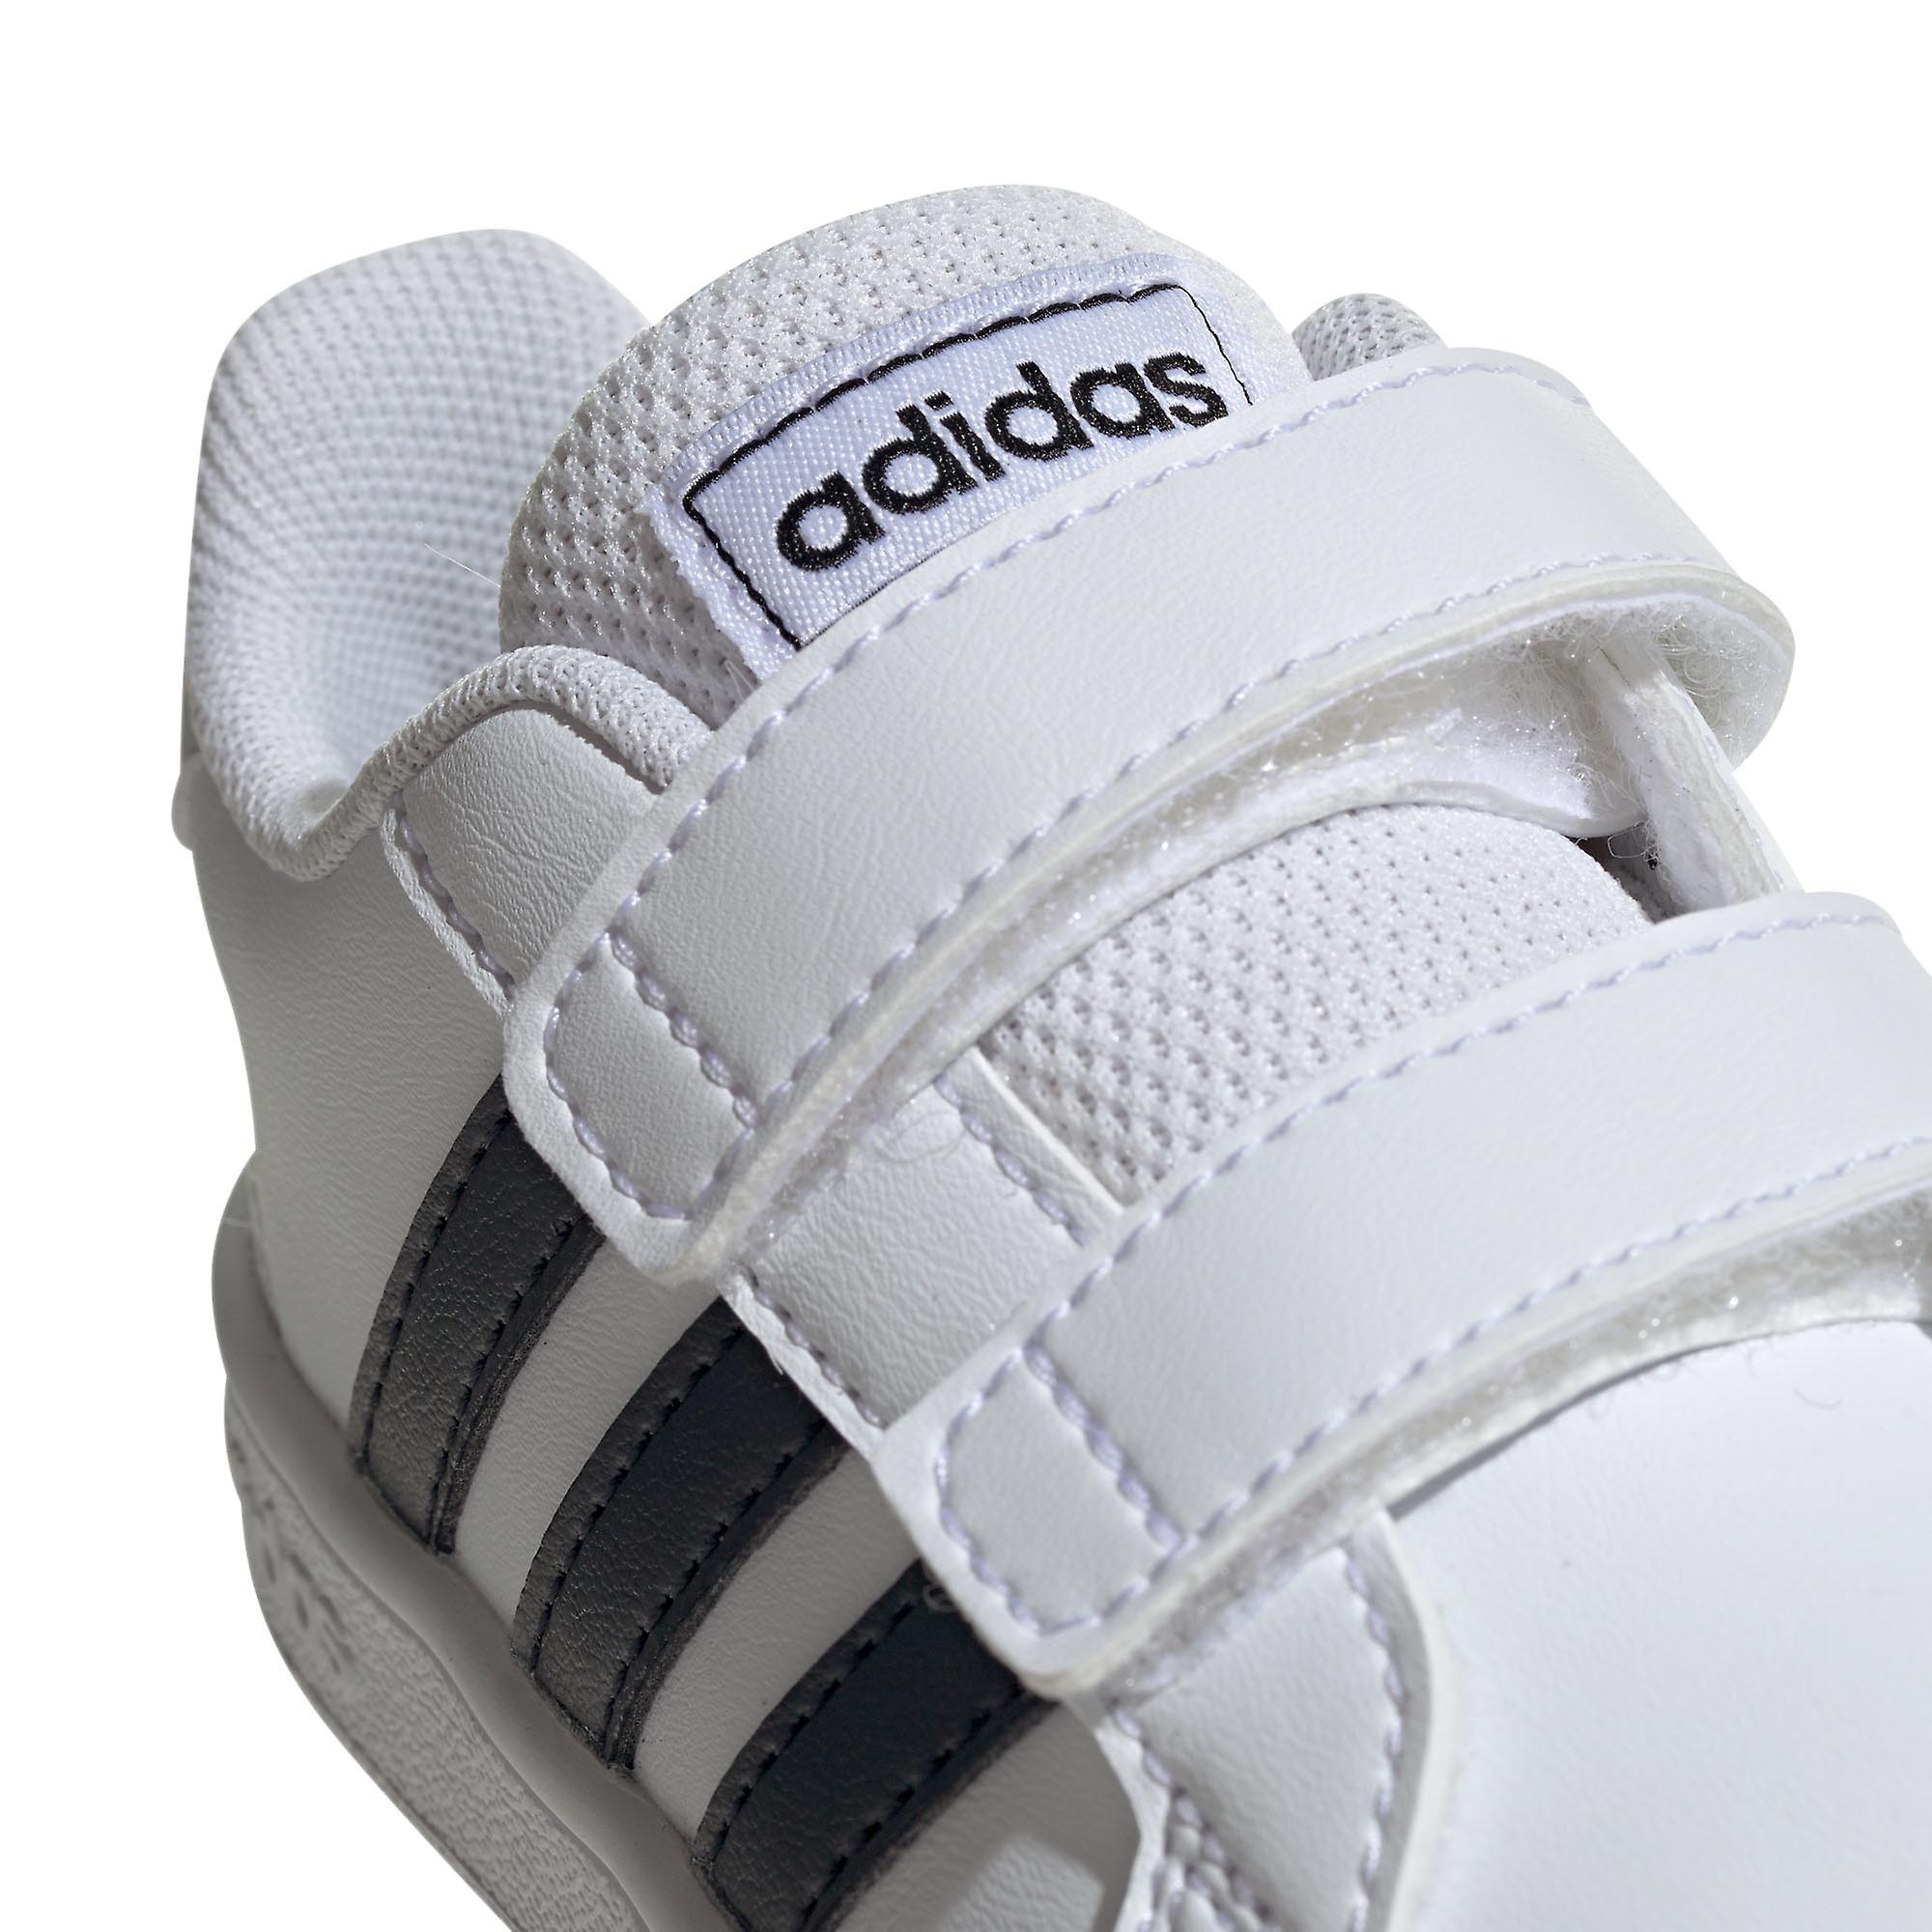 adidas Grand Court Infant Kids Sports Fashion Trainer Shoe White/Black